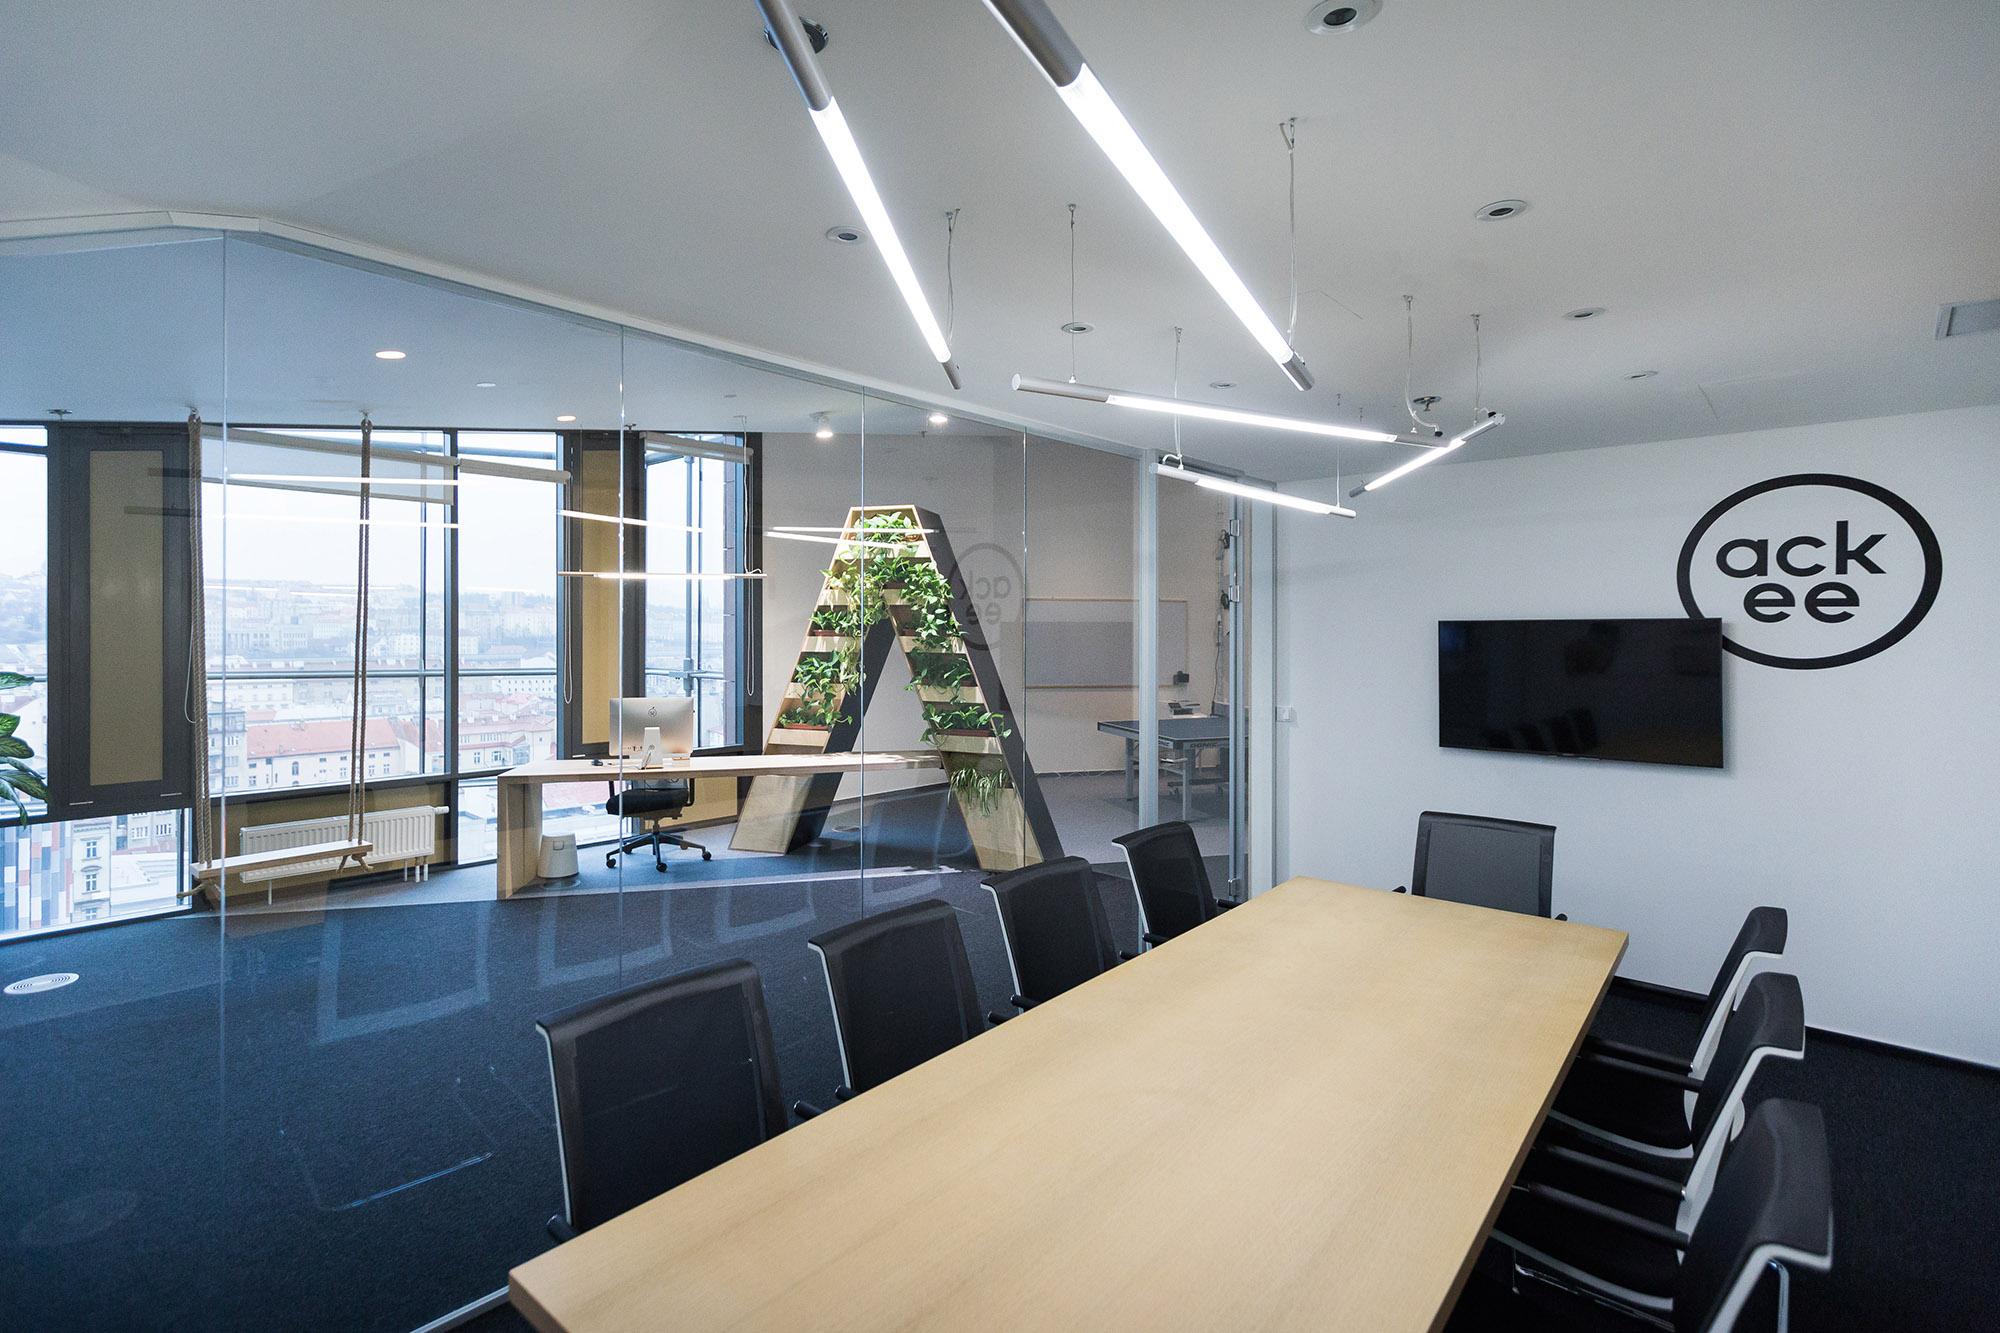 ackee-office-22